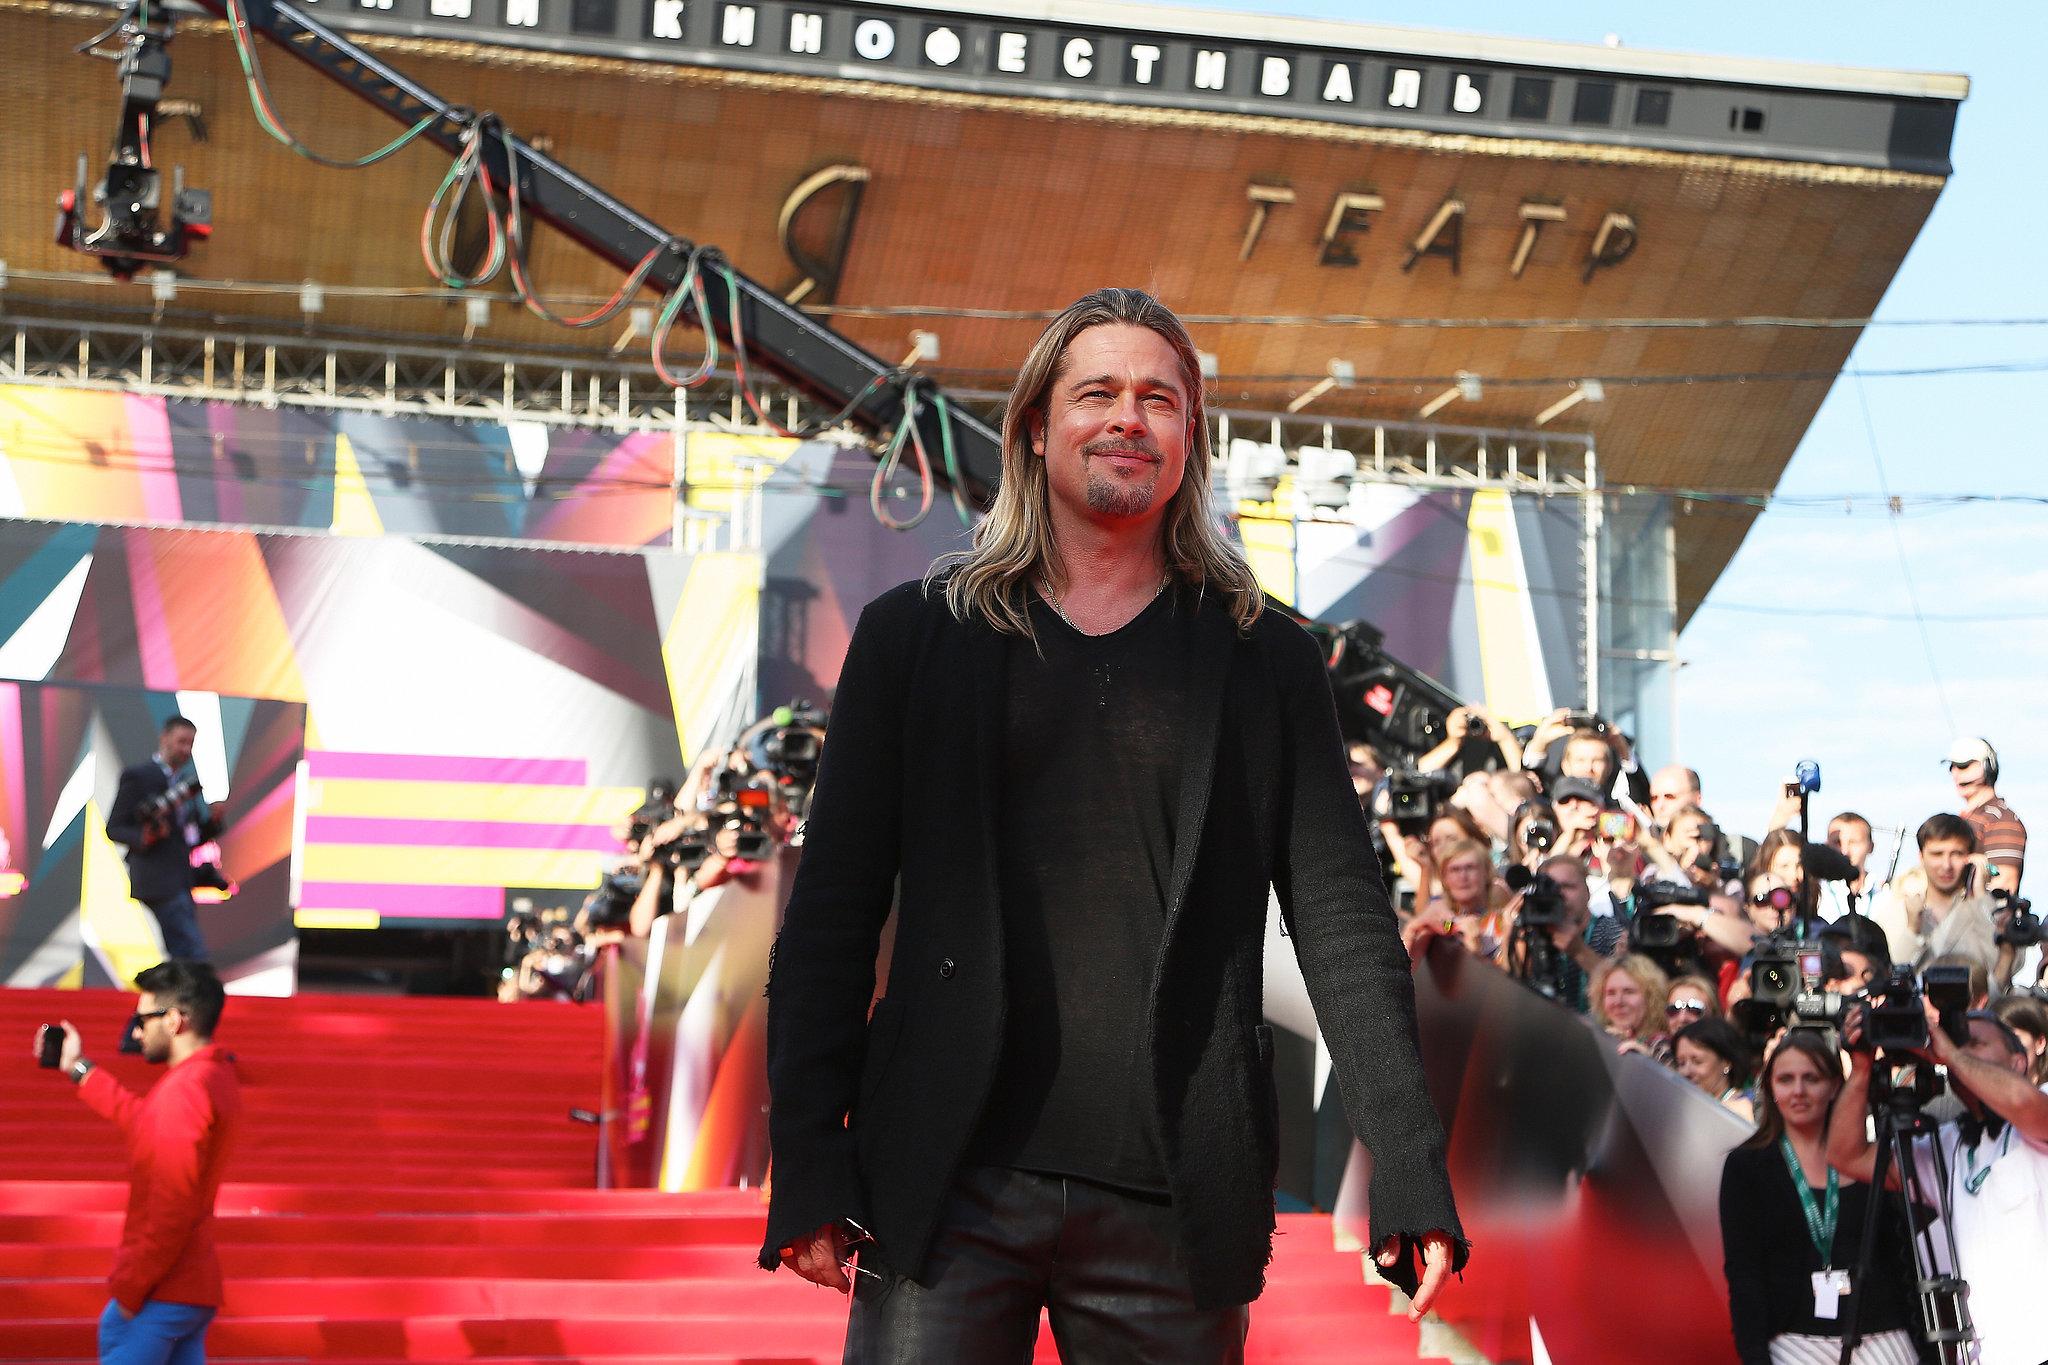 Brad Pitt attended the screening of World War Z in Russia.